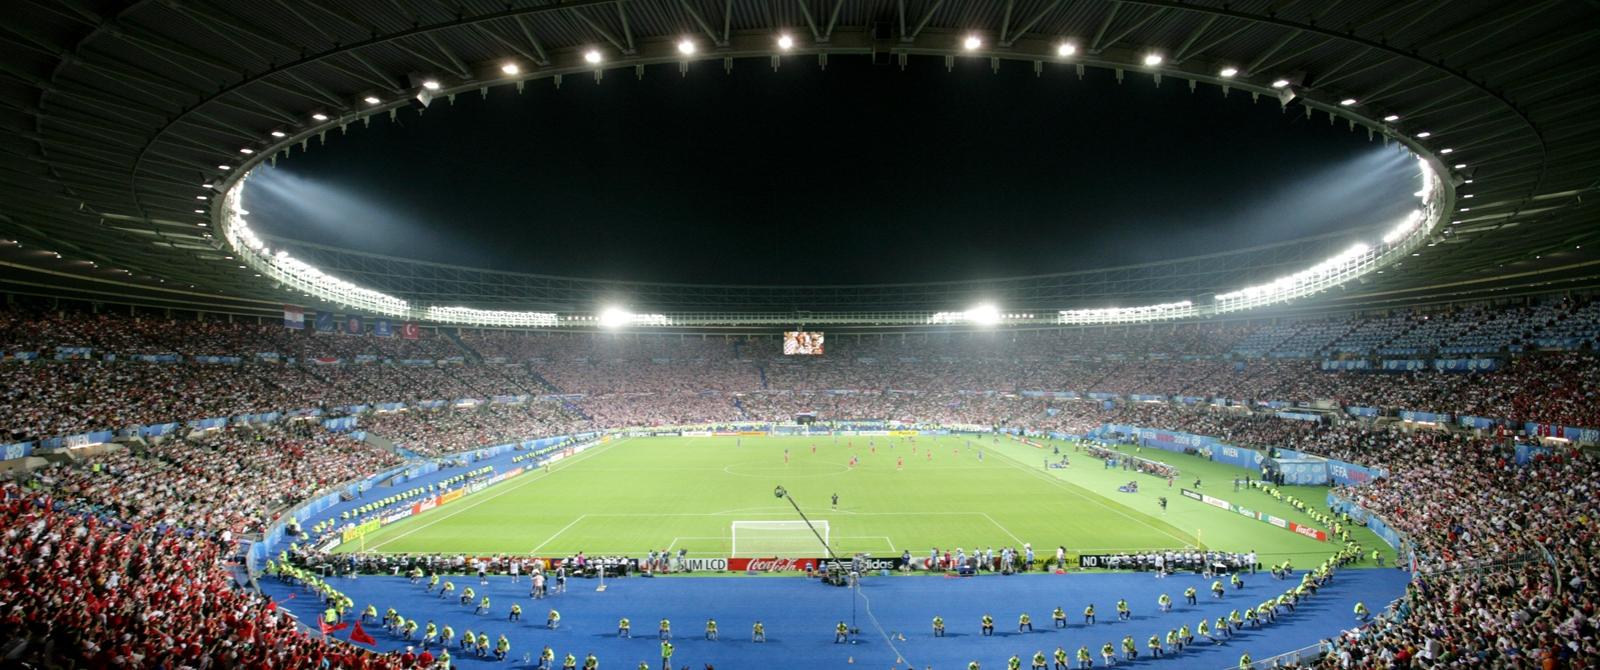 Austria Vienna VS AC Milan ( BETTING TIPS, Match Preview & Expert Analysis )